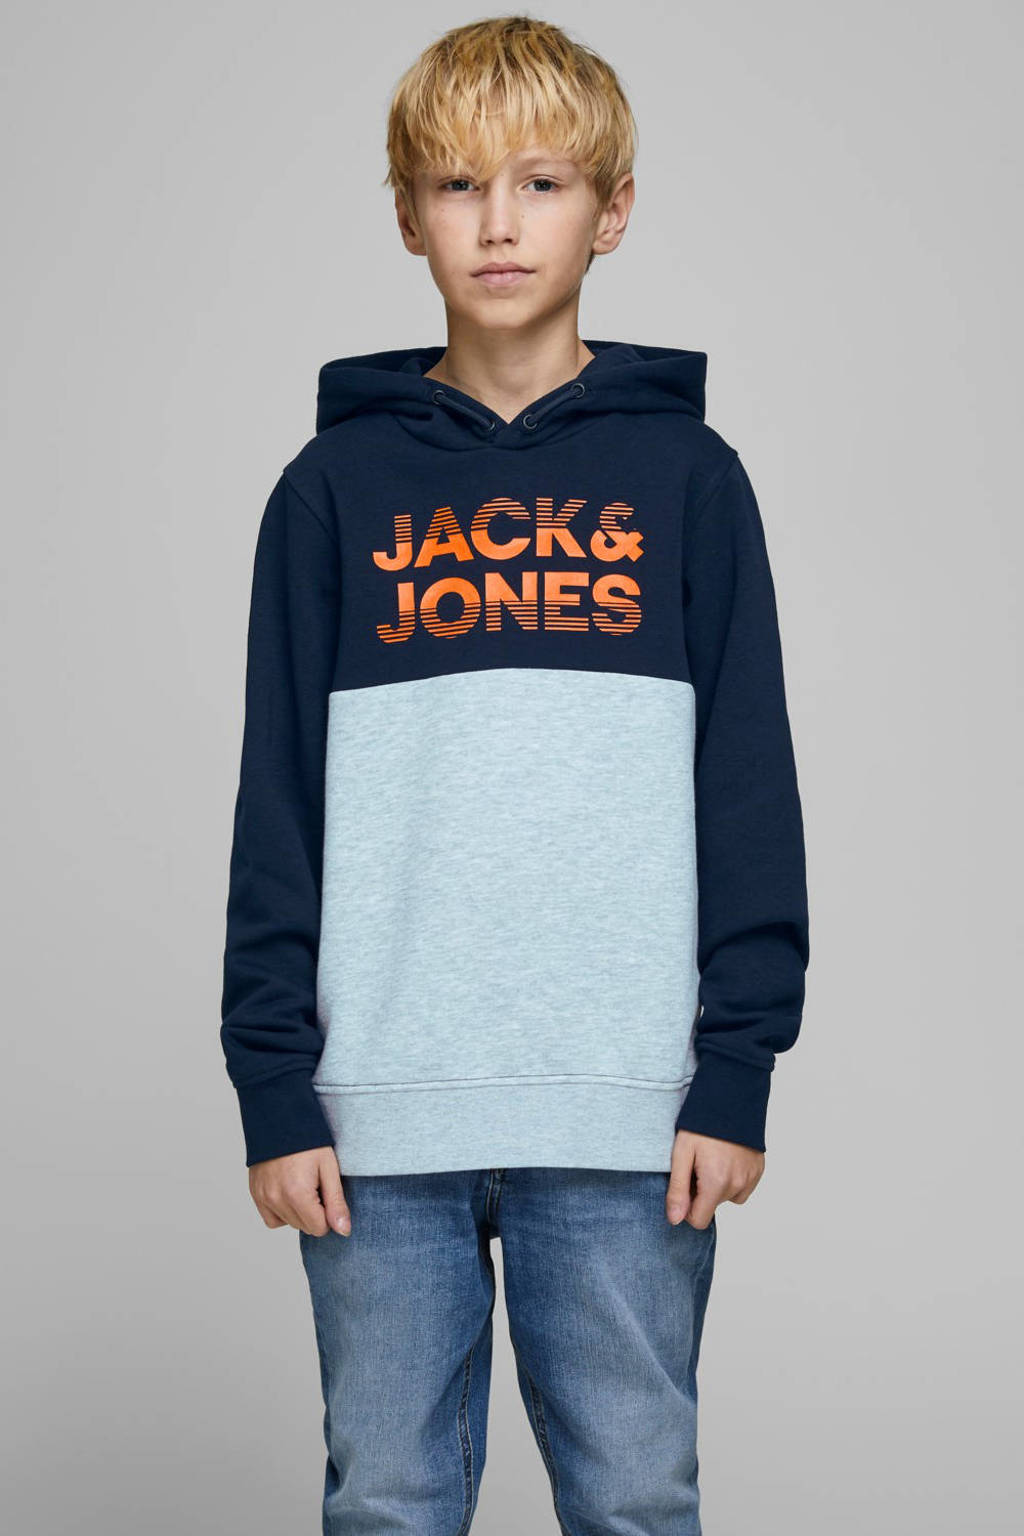 JACK & JONES JUNIOR hoodie Milla met tekst donkerblauw/grijs melange/oranje, Donkerblauw/grijs melange/oranje